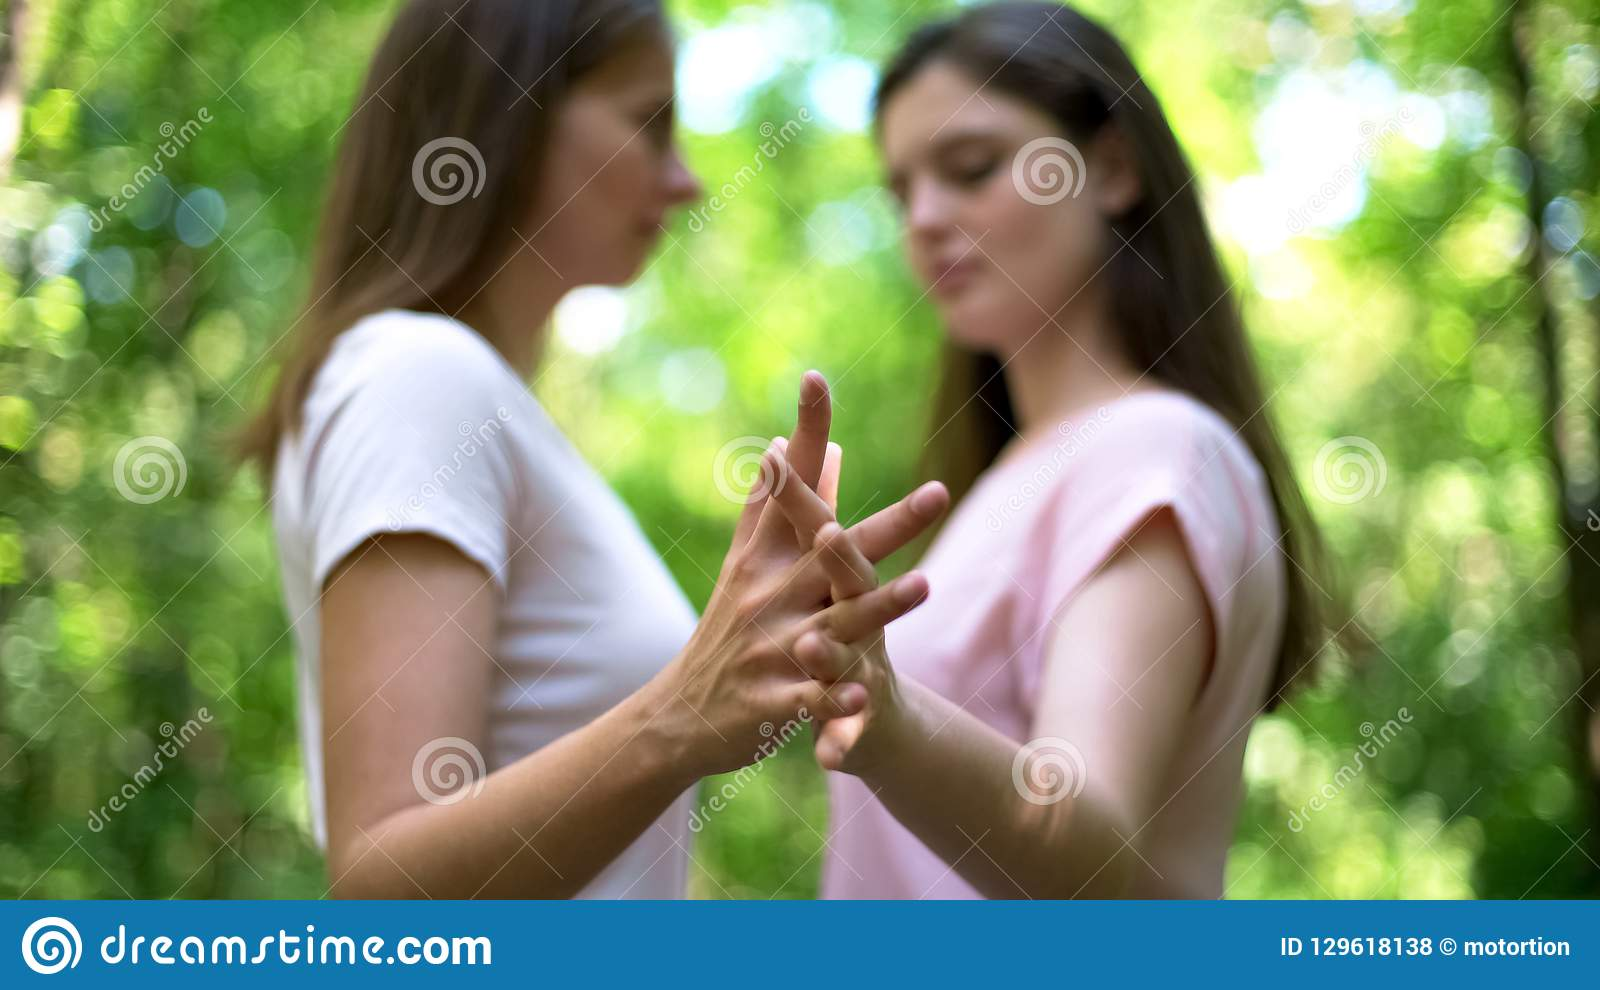 lesbian sex conversation